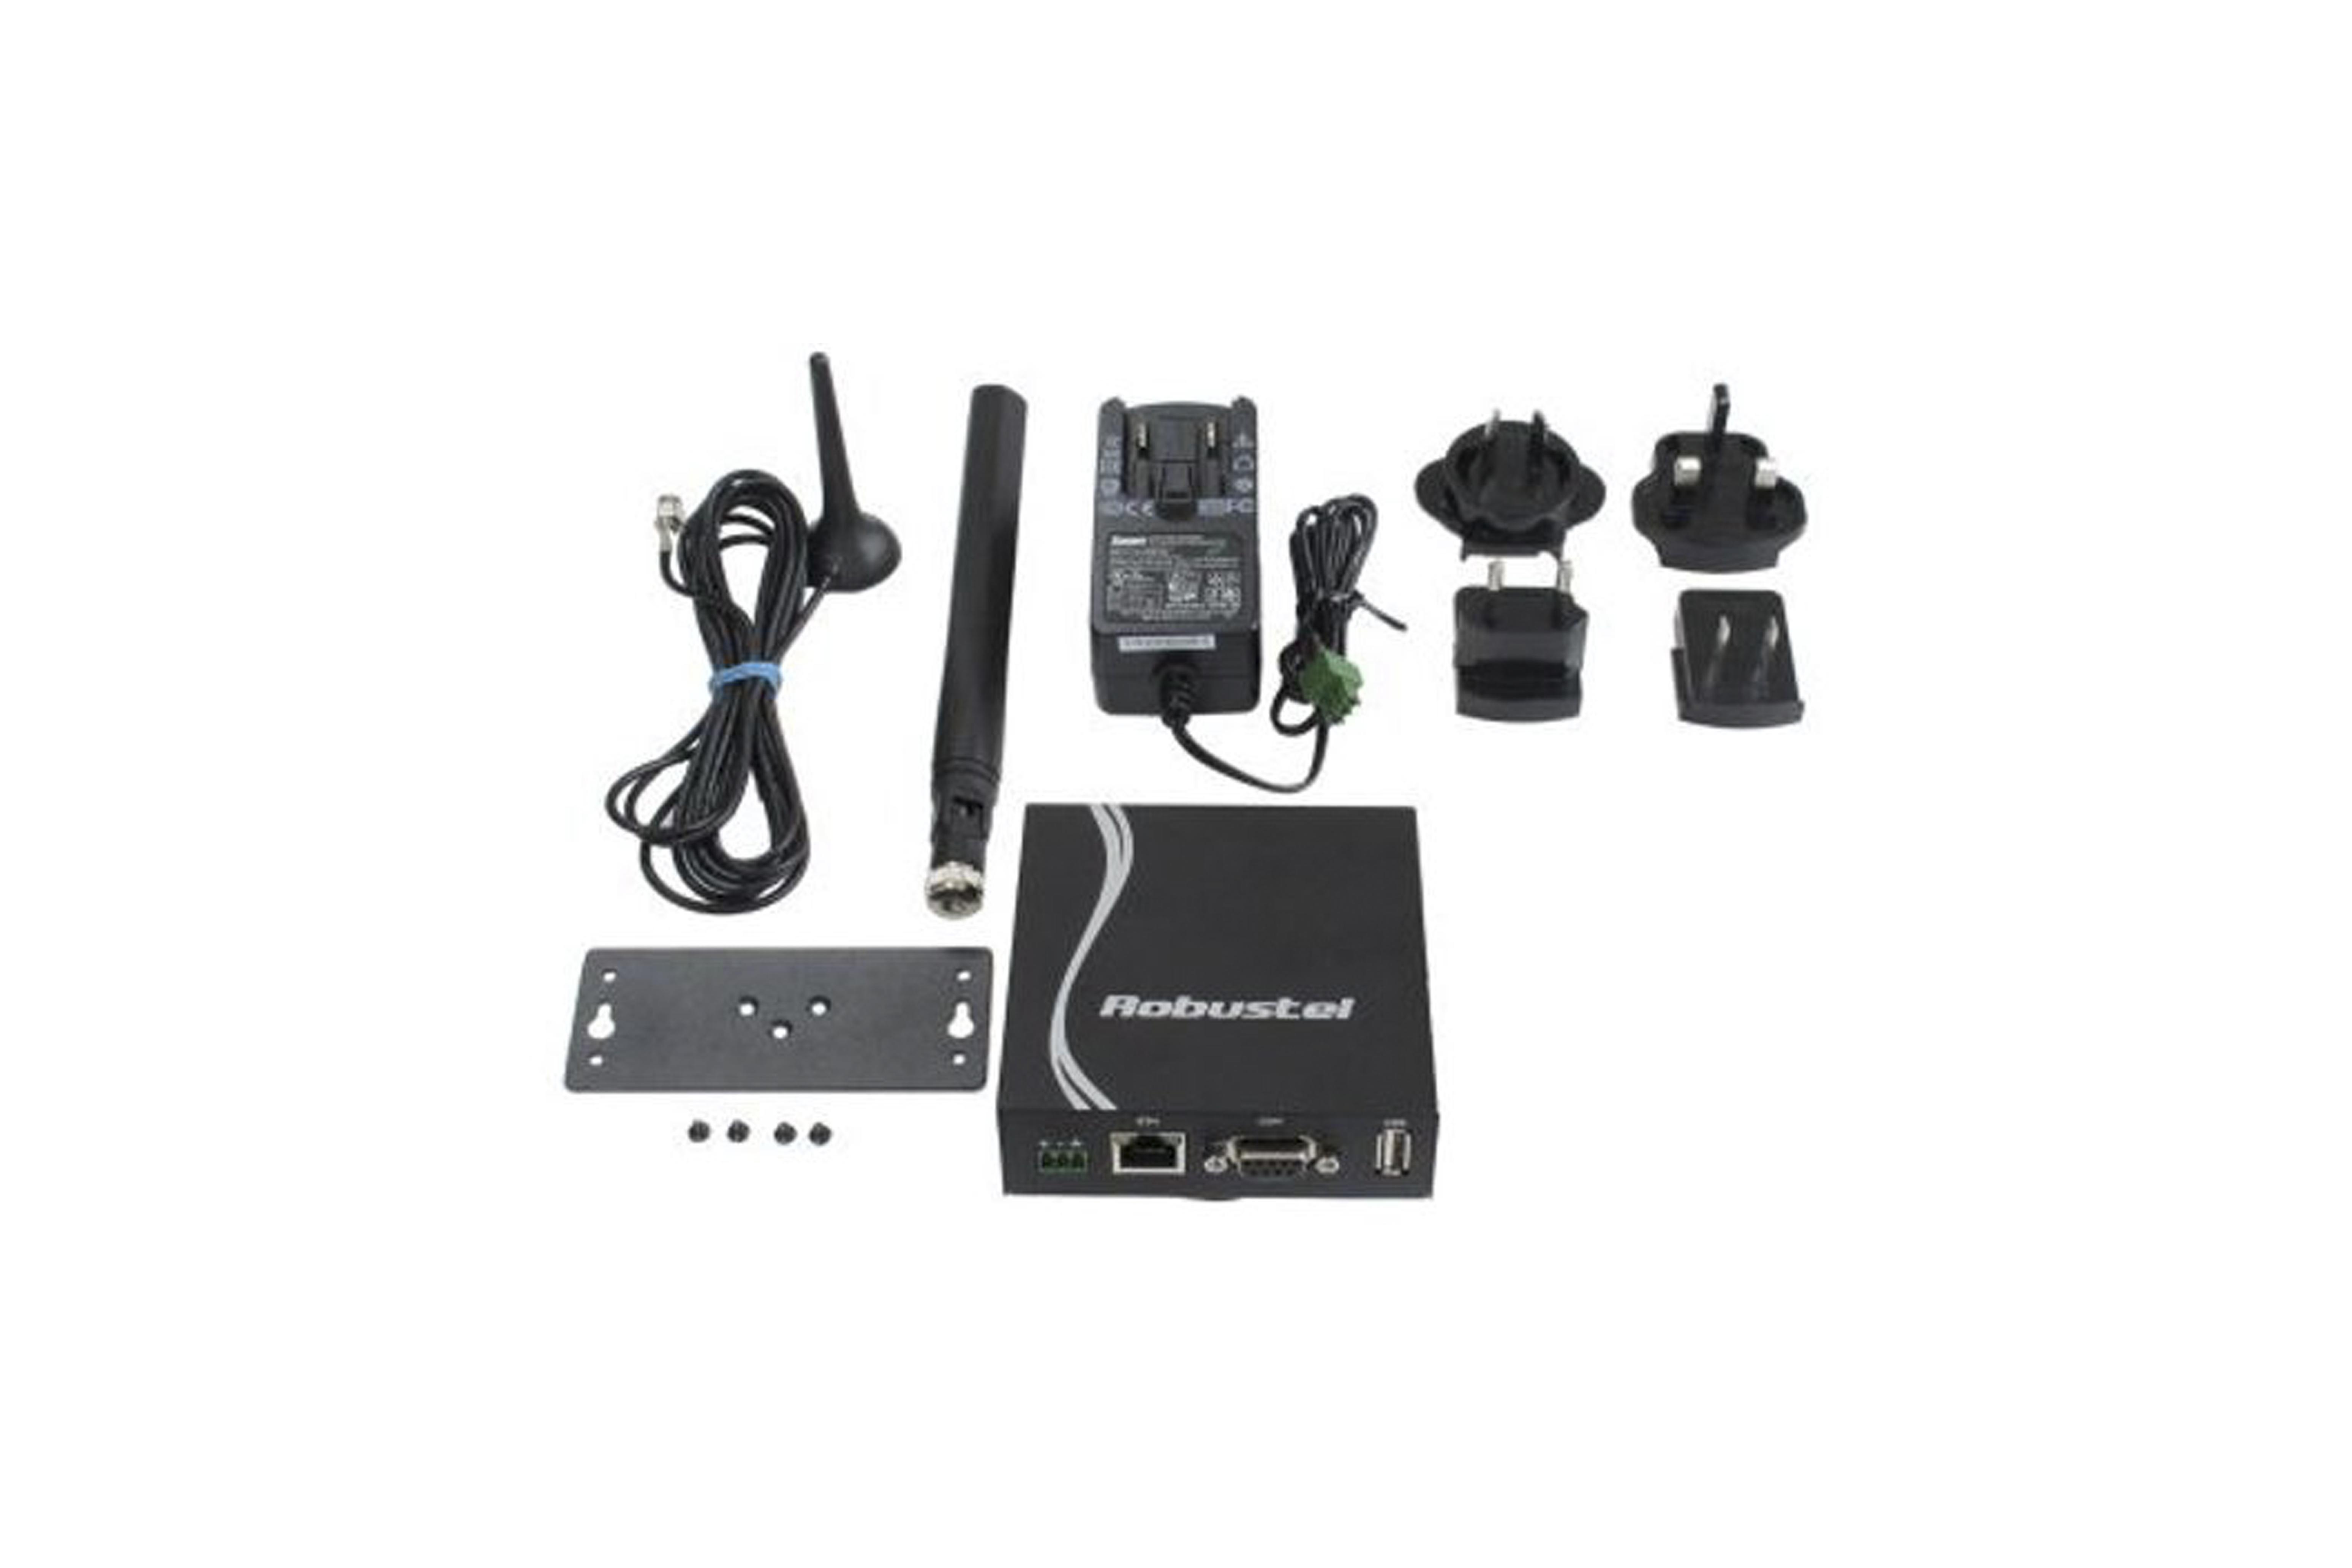 STARTPAKKET INDUSTRIËLE MODEMROUTER 3G